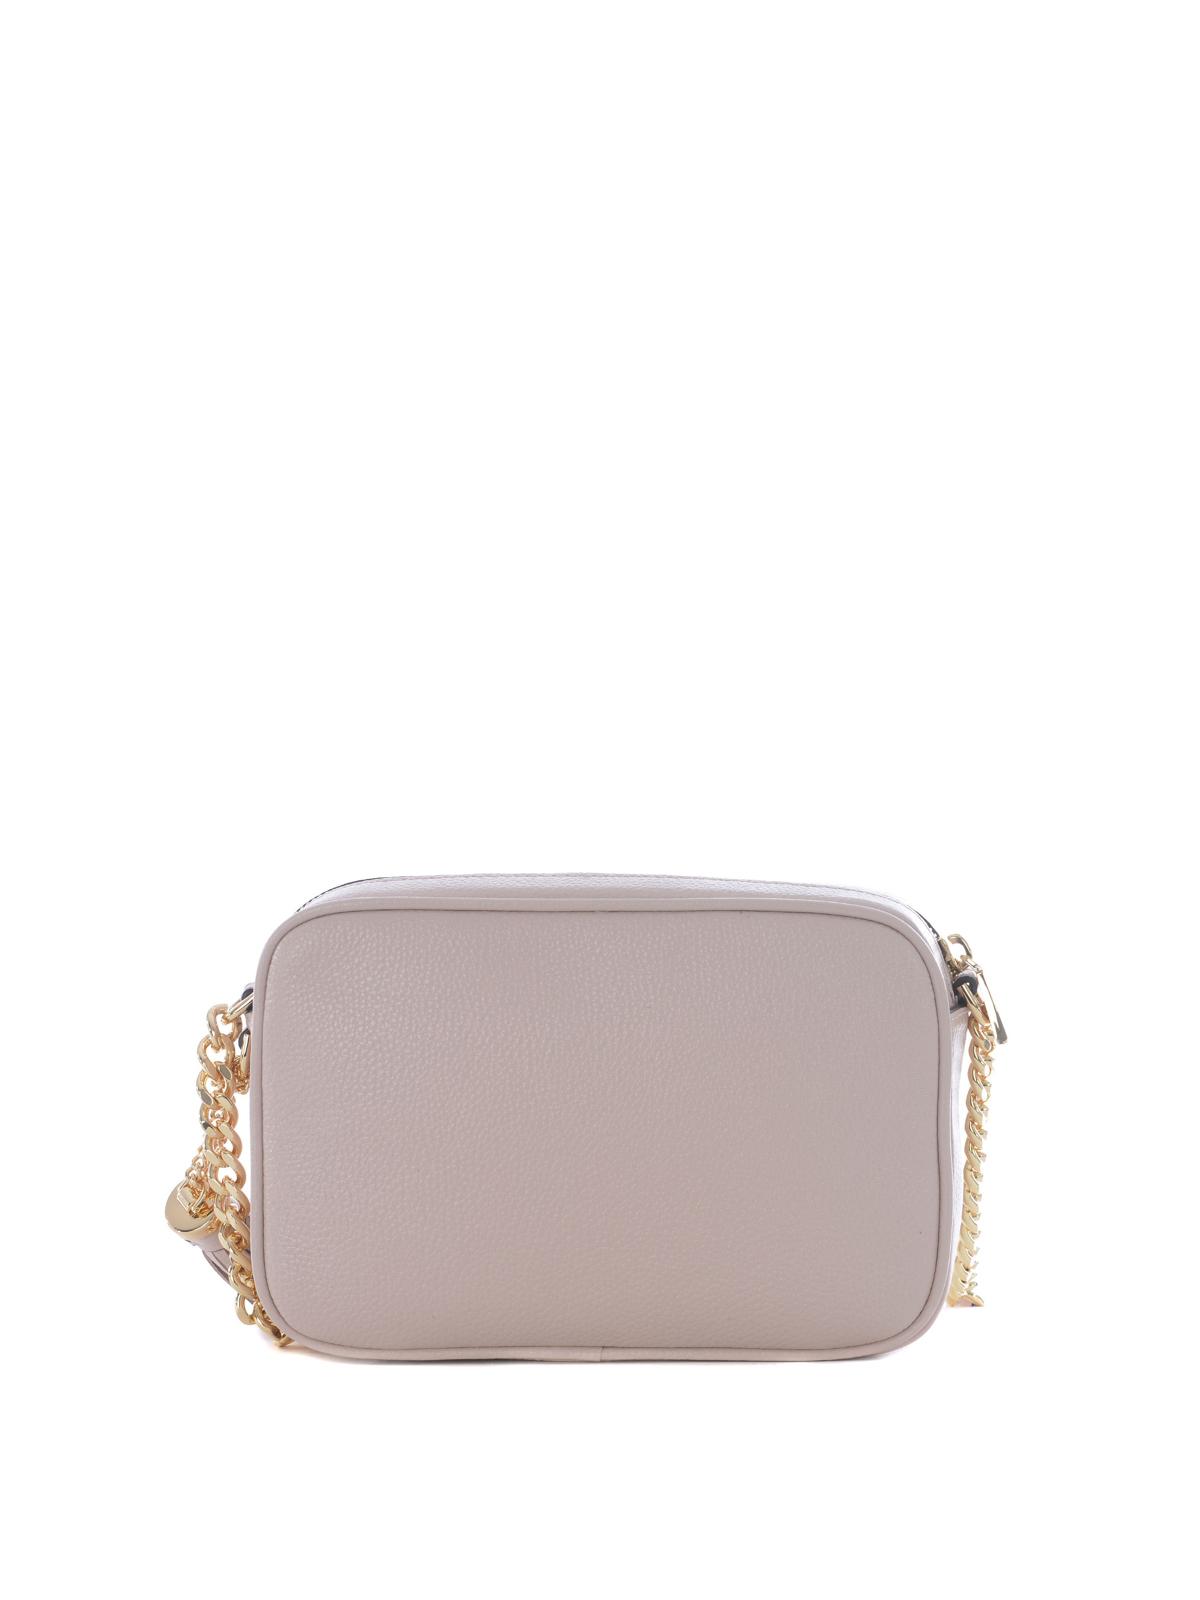 Michael Kors Ginny pink leather camera bag cross body